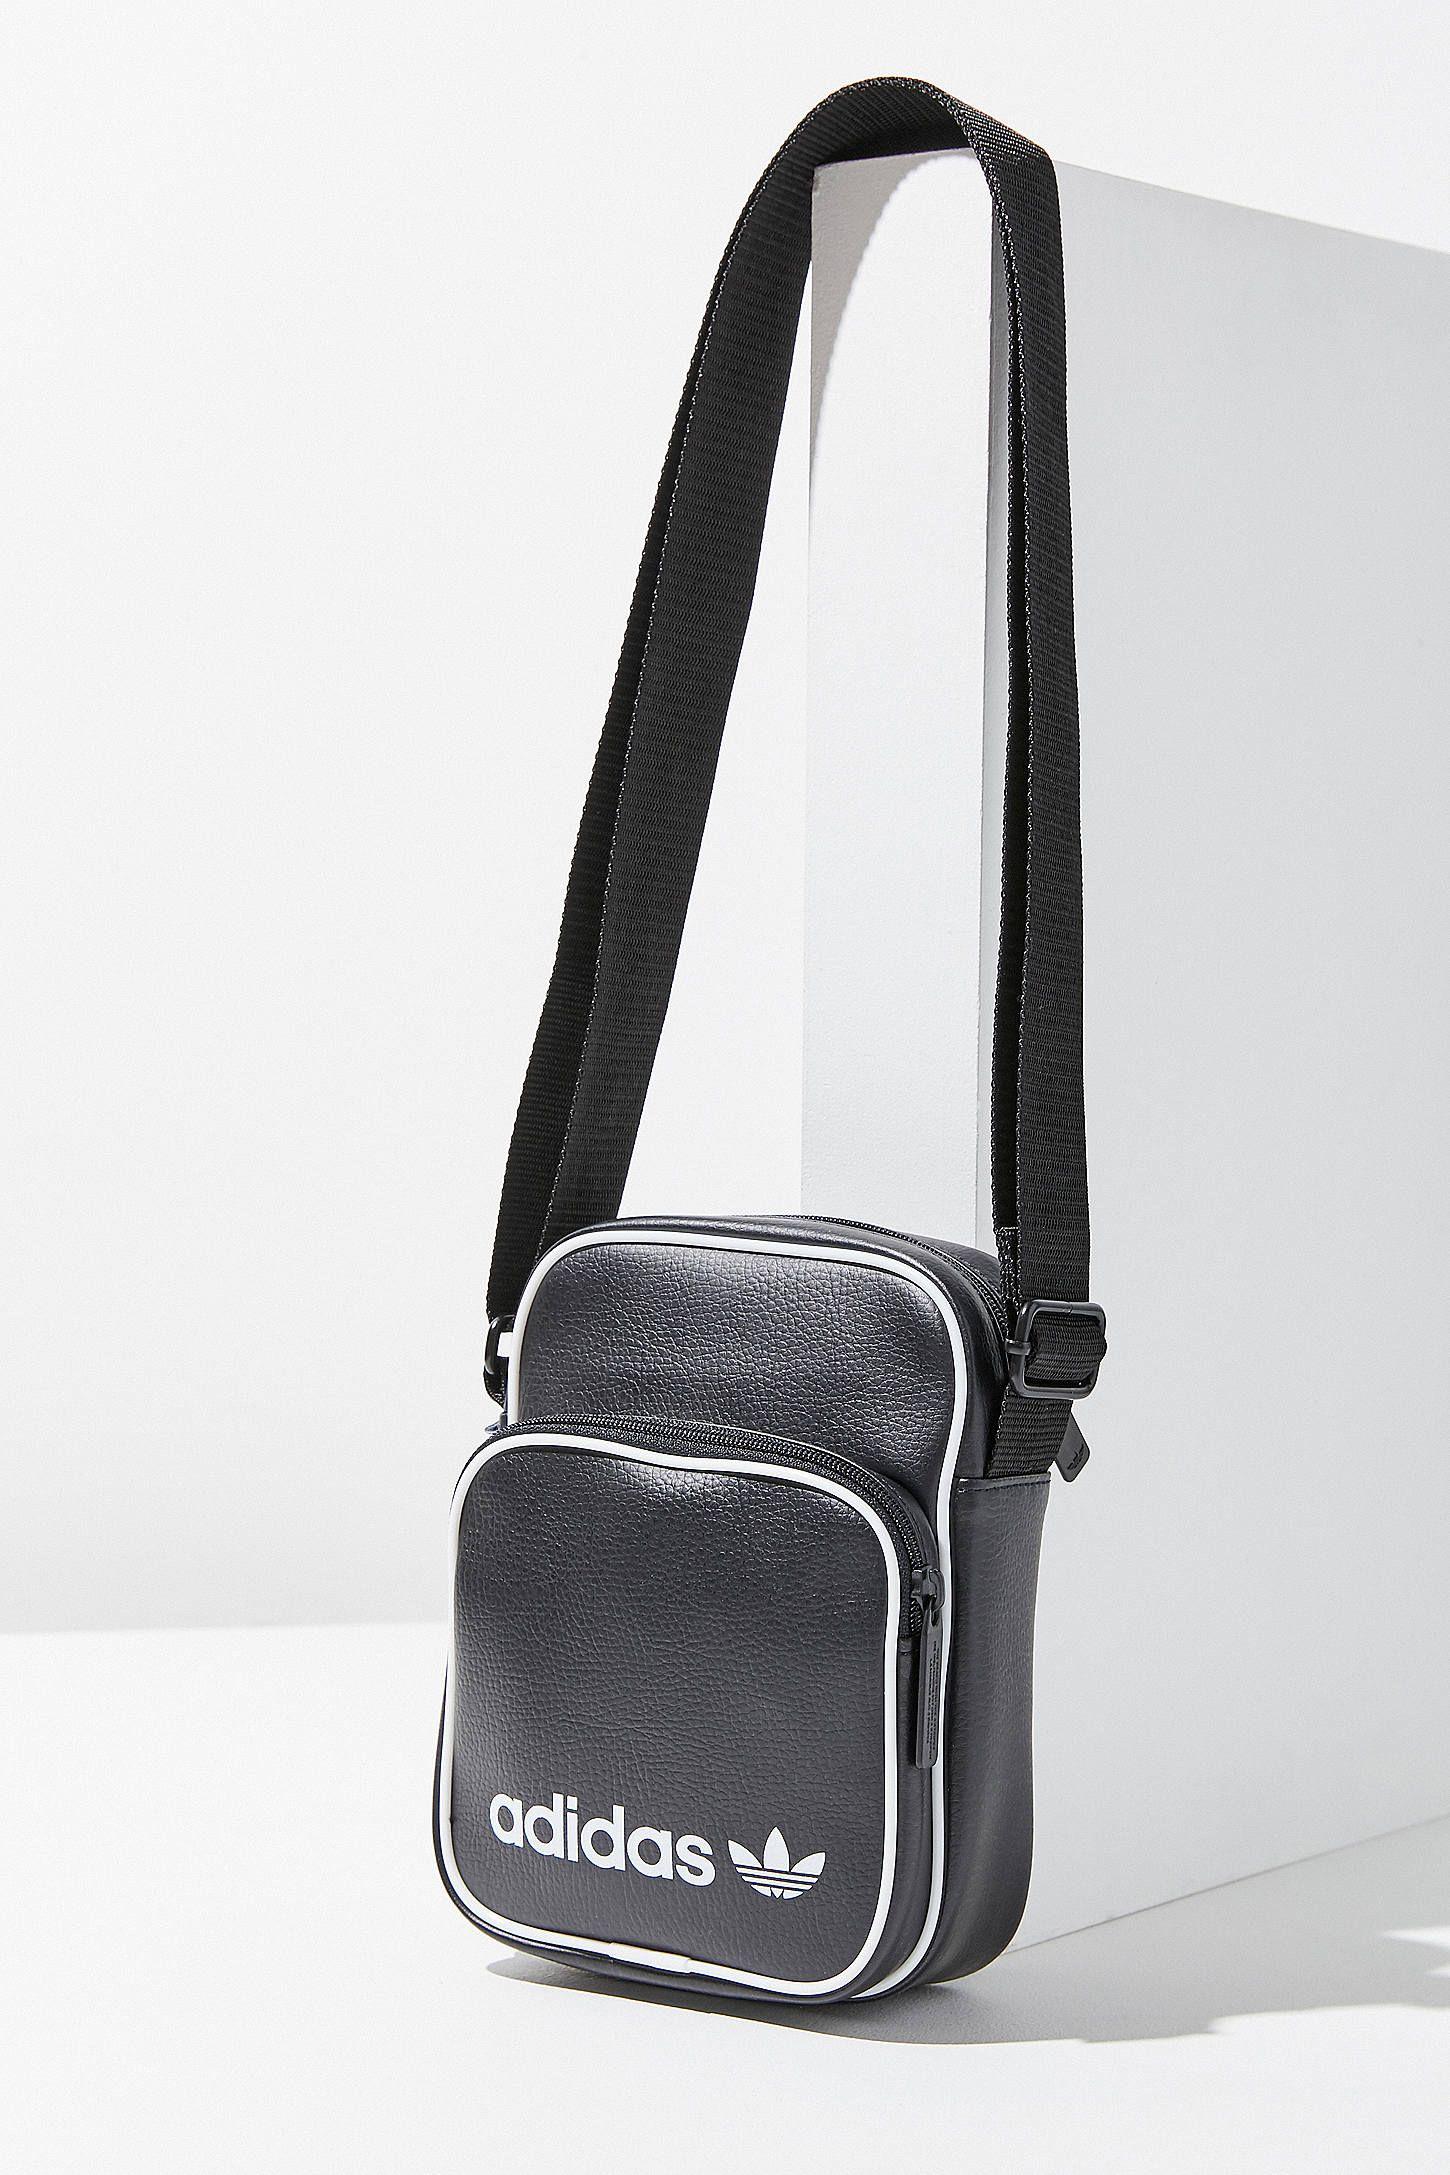 fae8751dda Mini Adidas Backpack Urban Outfitters- Fenix Toulouse Handball